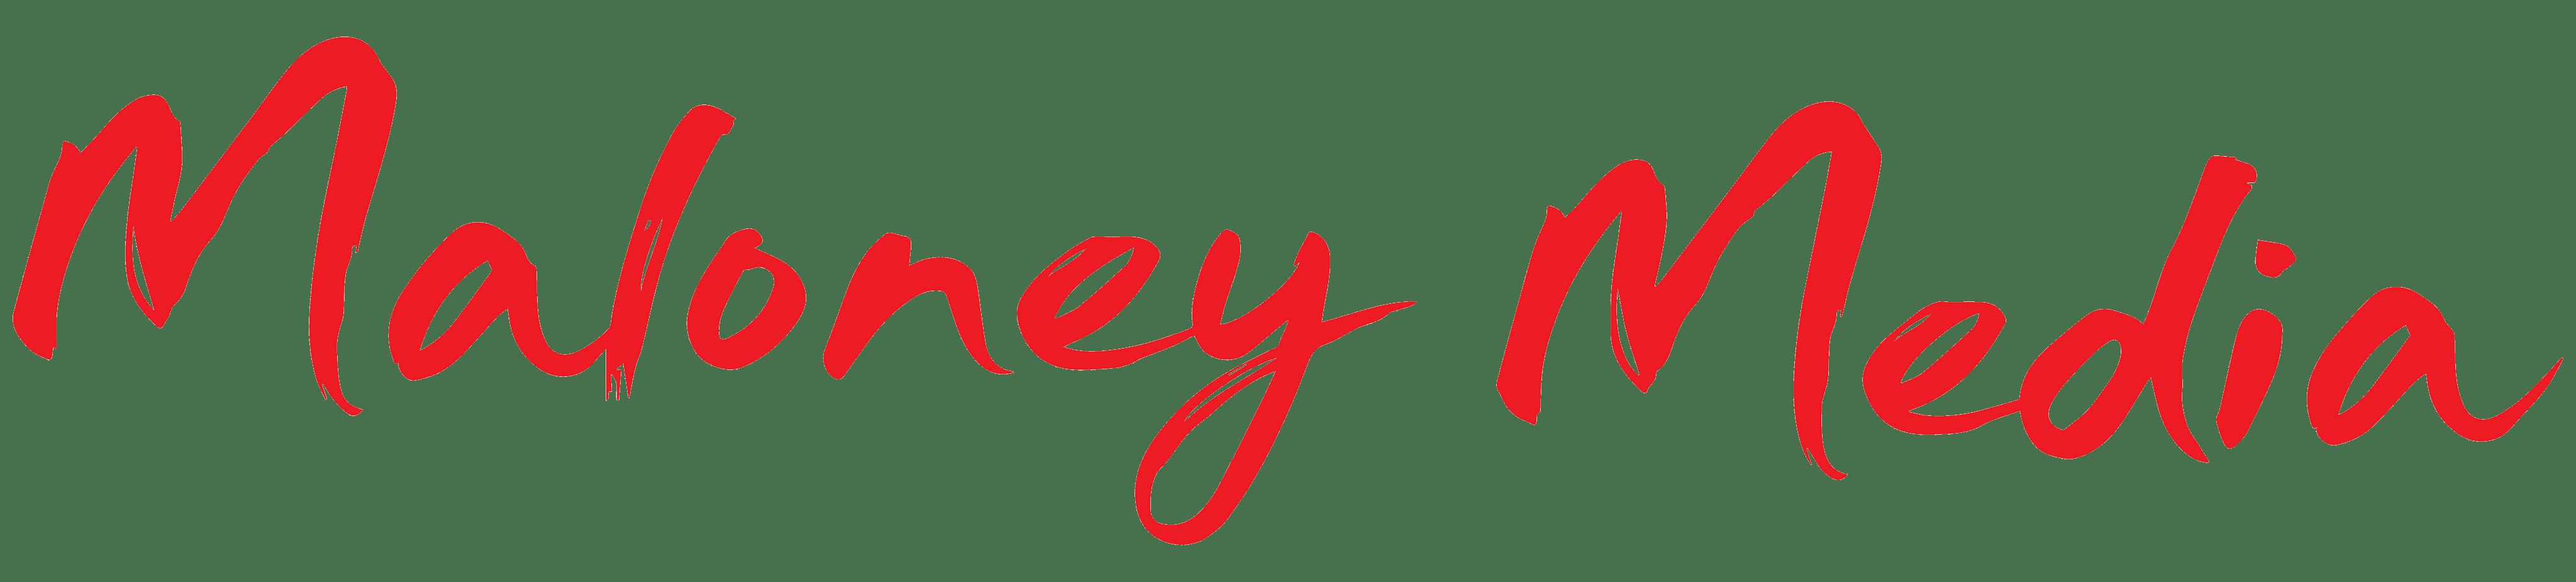 Maloney Media   Internet Marketing Experts